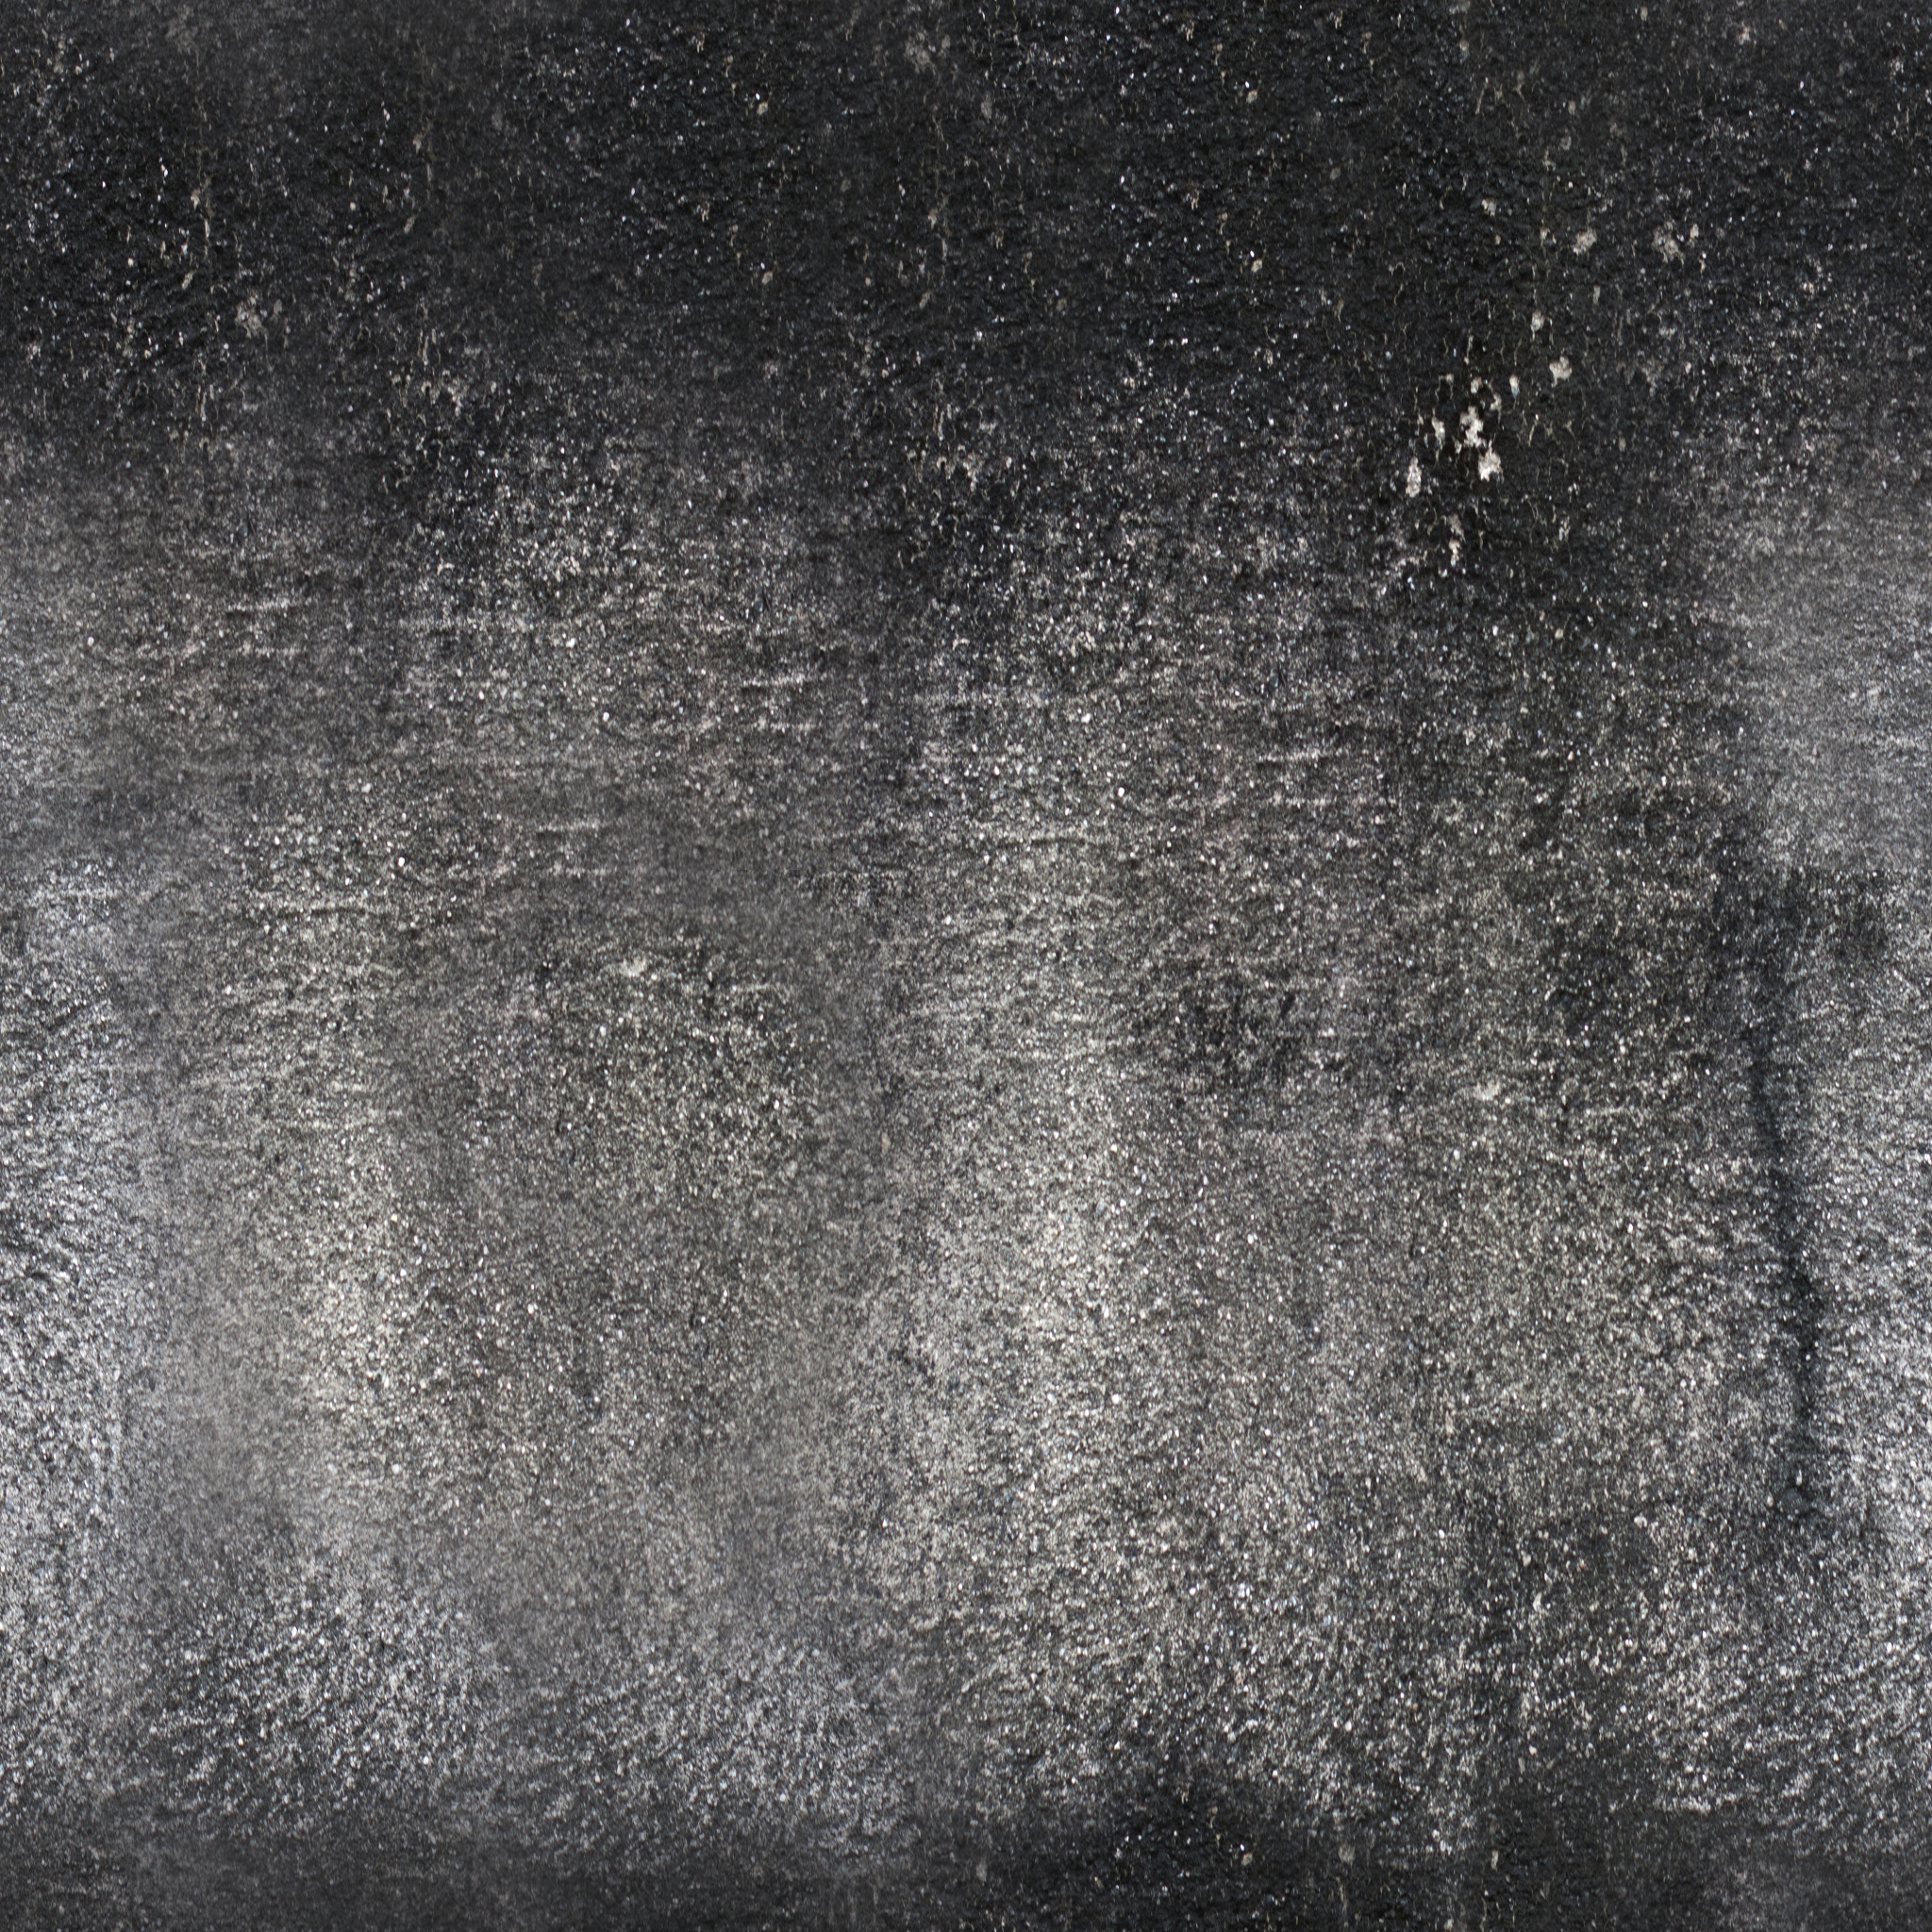 Dark Burt Concrete.jpg